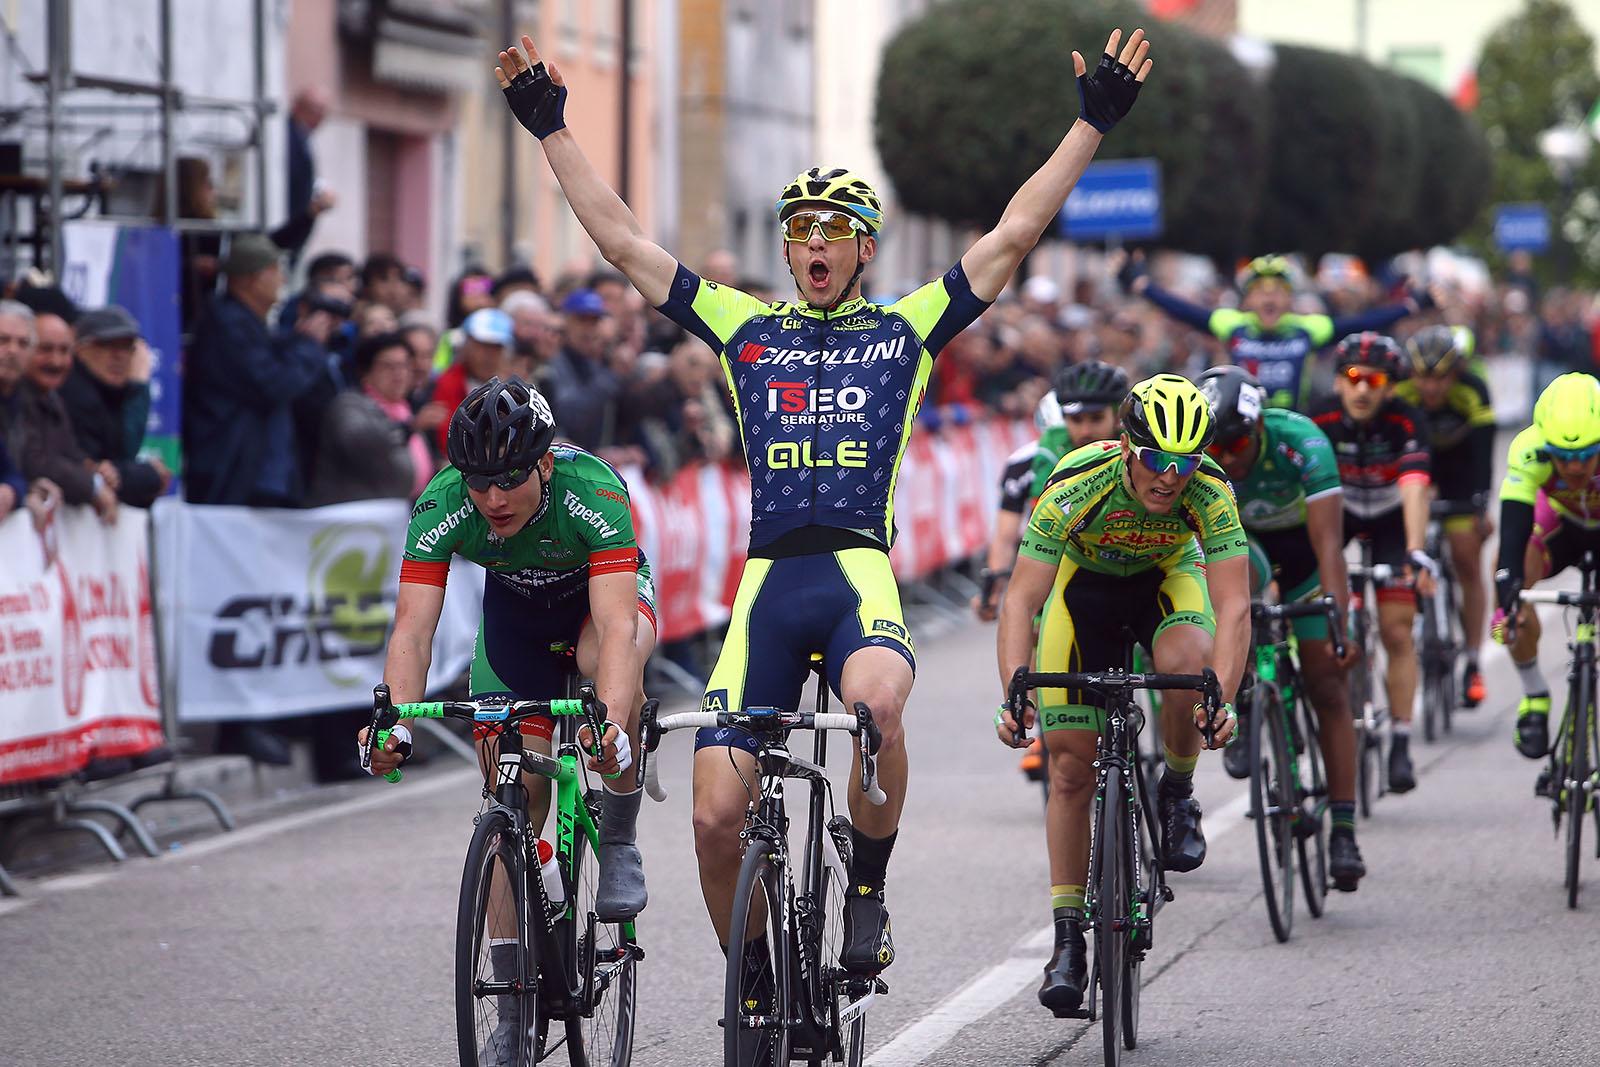 Leonardo Fedrigo vince a Bagnolo di Nogarole Rocca